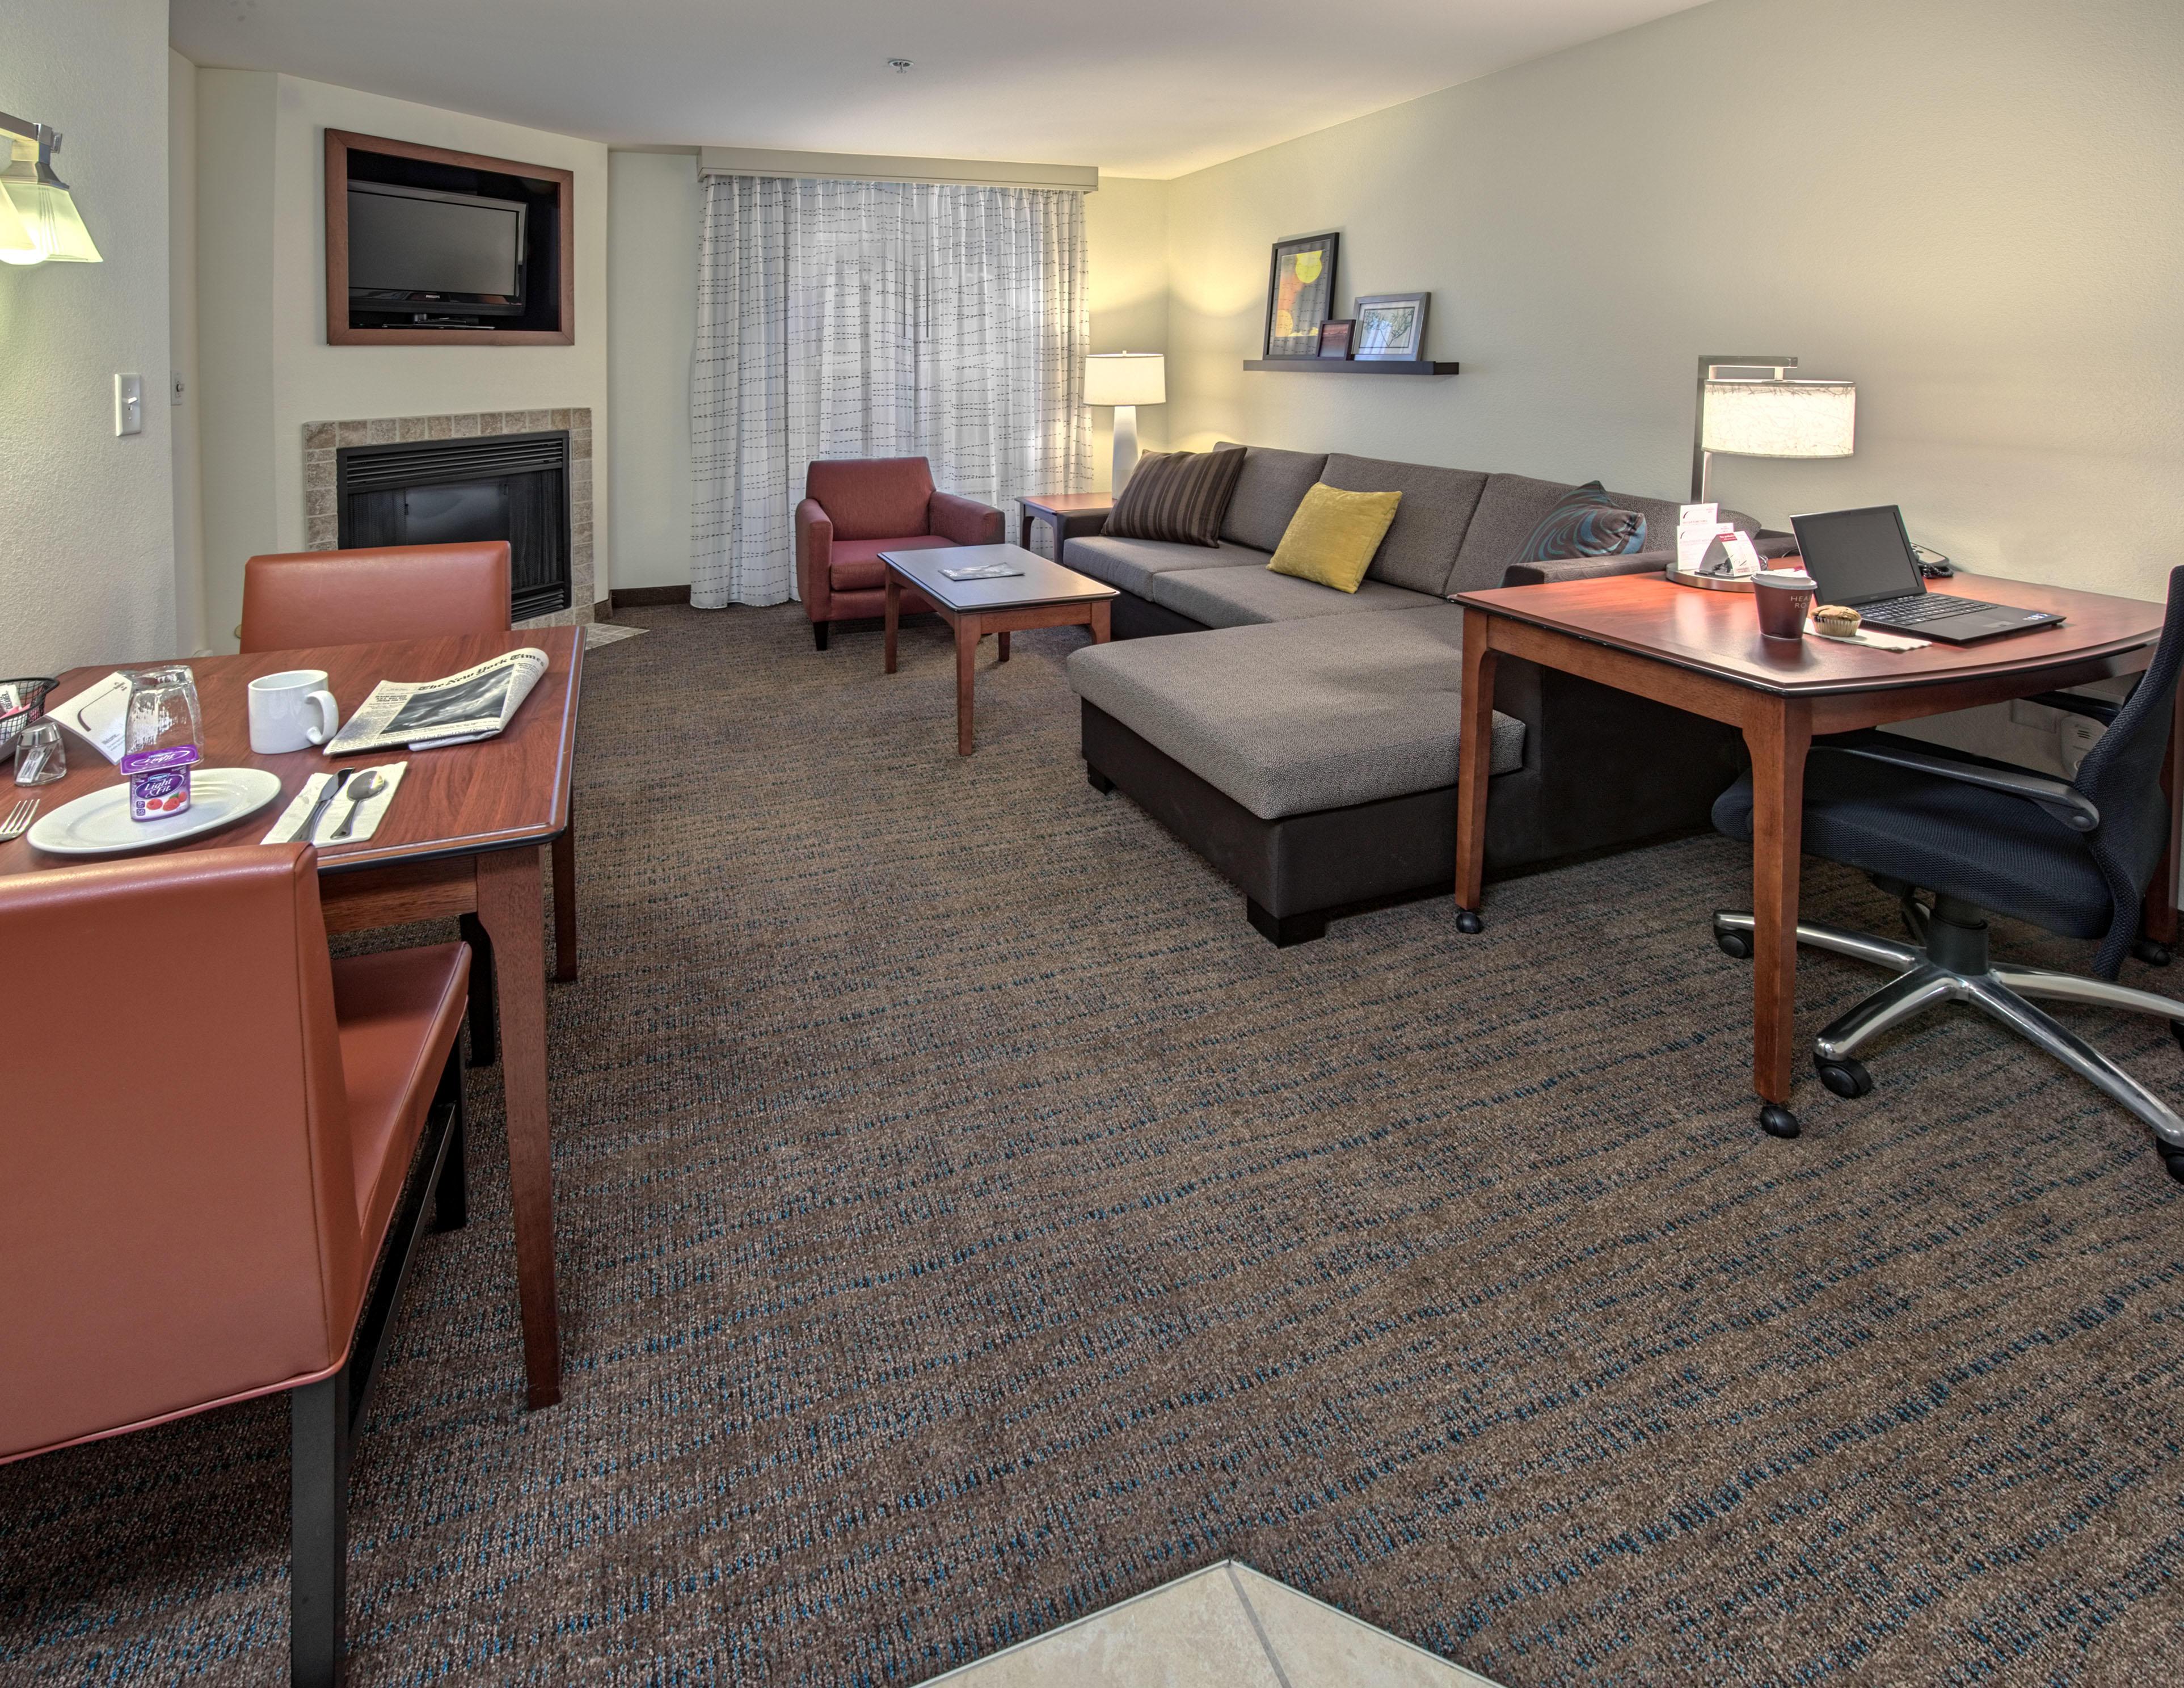 Residence Inn by Marriott Fayetteville Cross Creek image 4